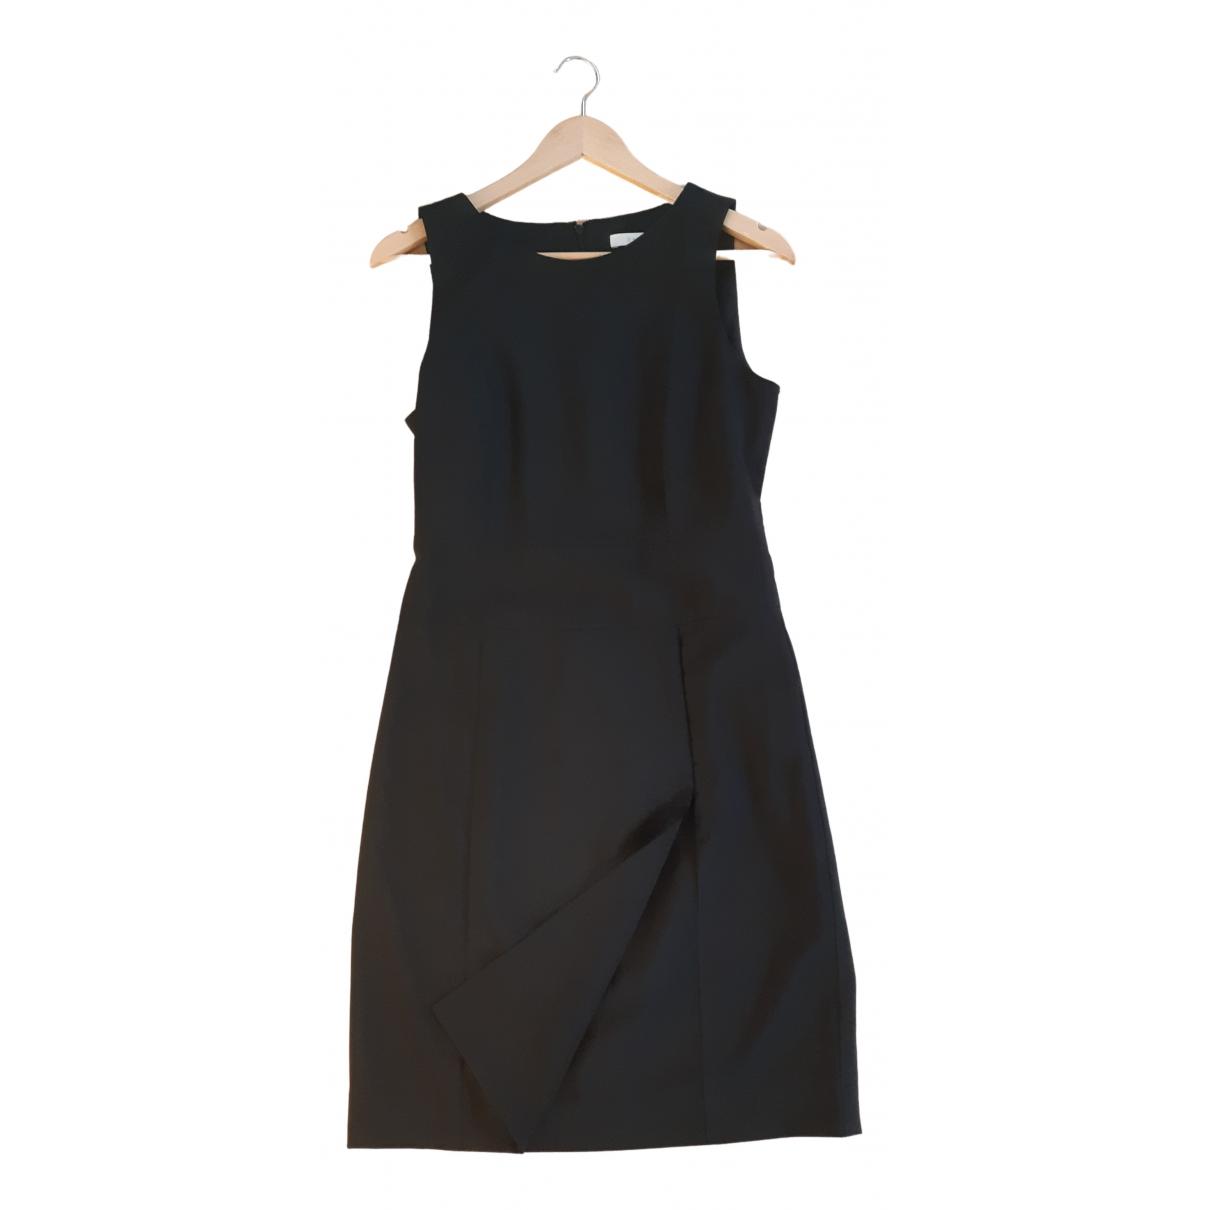 Zapa \N Kleid in  Schwarz Synthetik